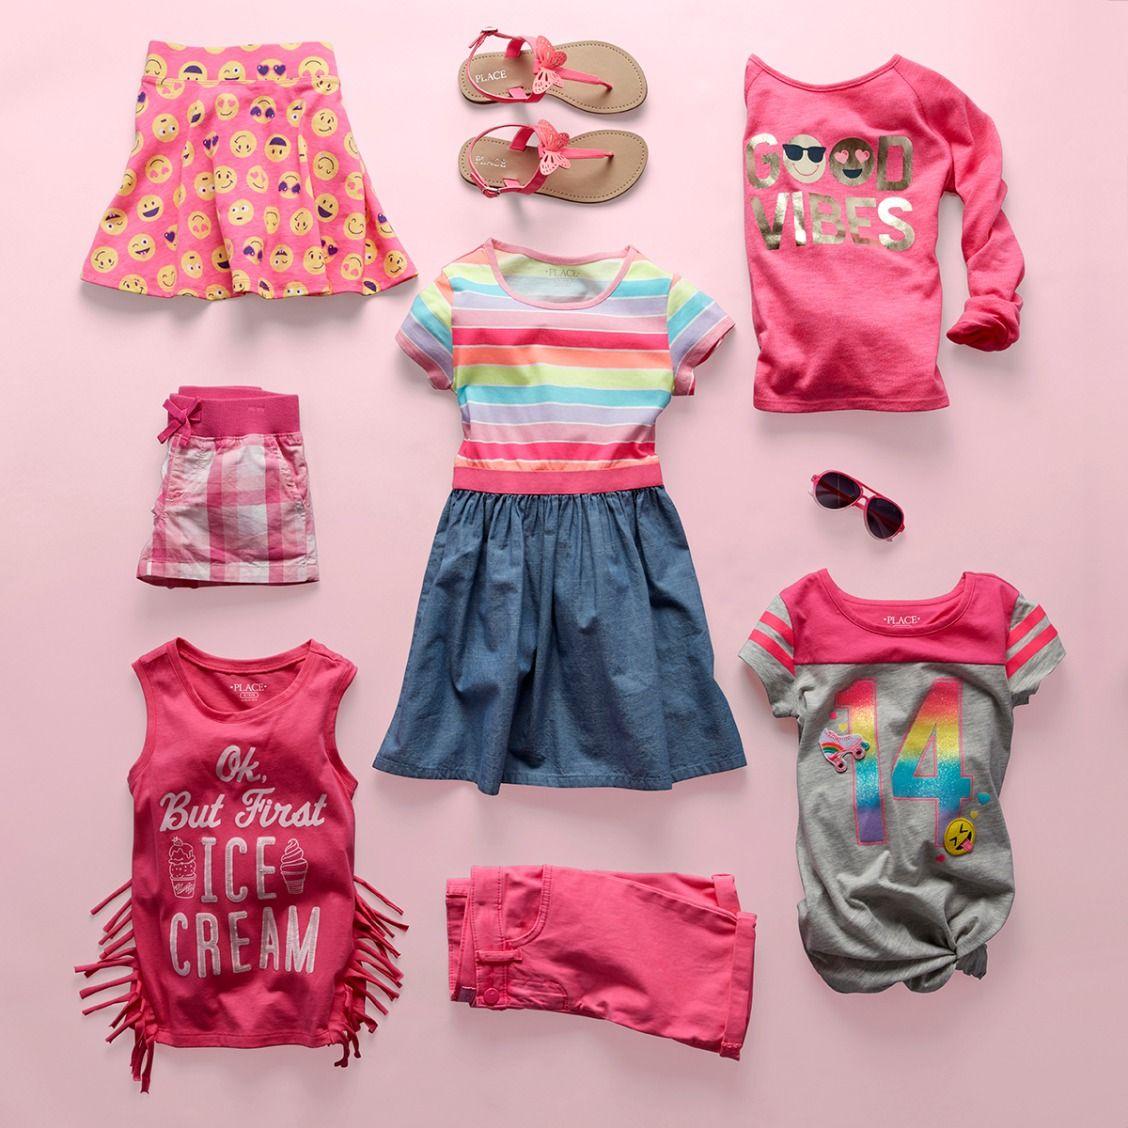 Pink dress emoji  Girlsu fashion  Kidsu clothes  Rainbow stripe dress  Graphic top